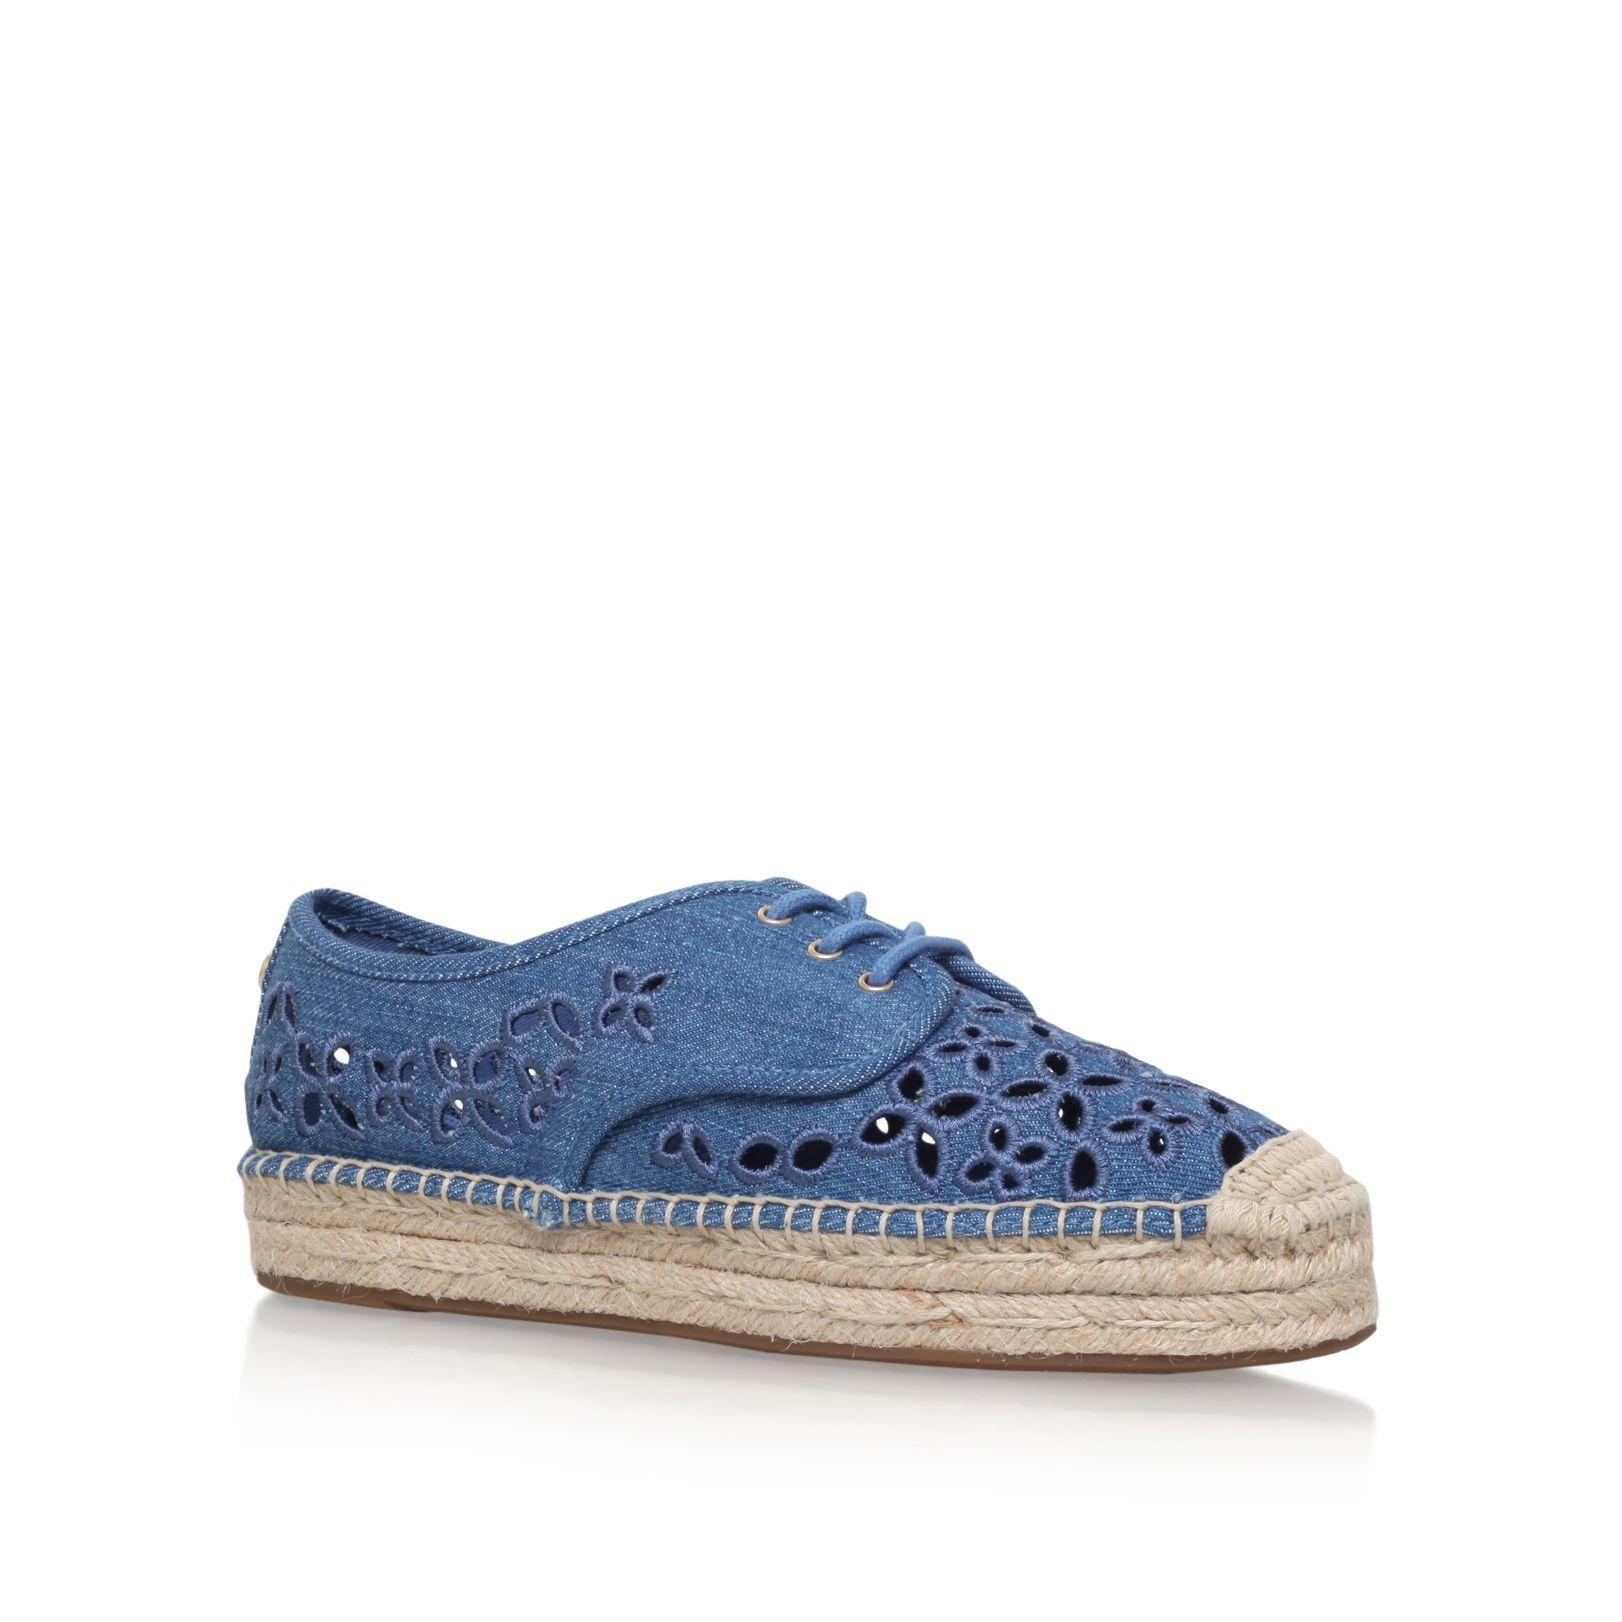 Michael Kors Darci flat lace up espadrilles, Blue